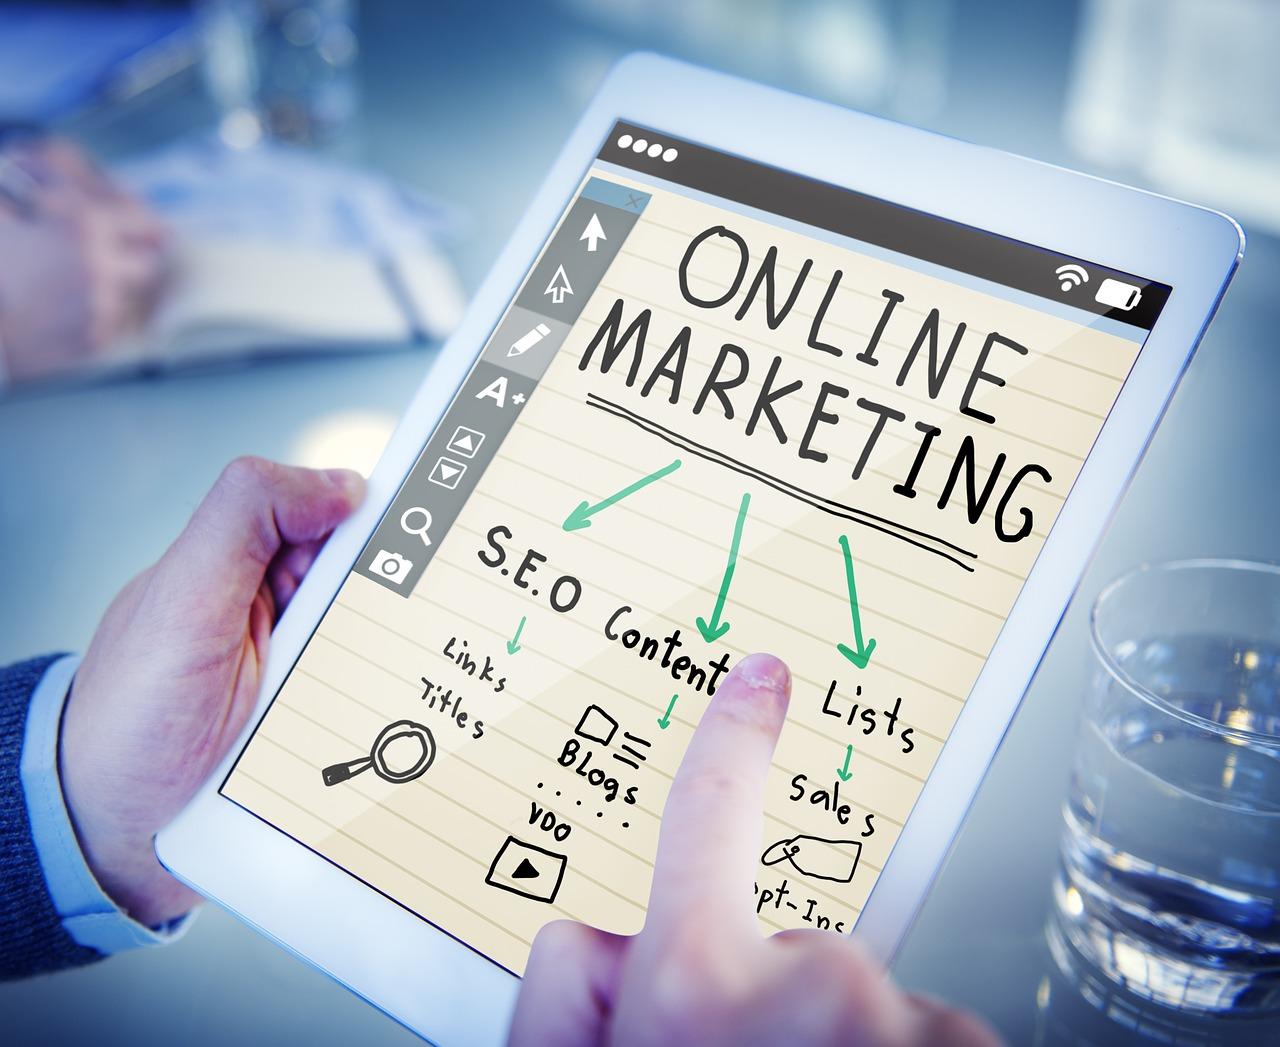 online presence using digital marketing